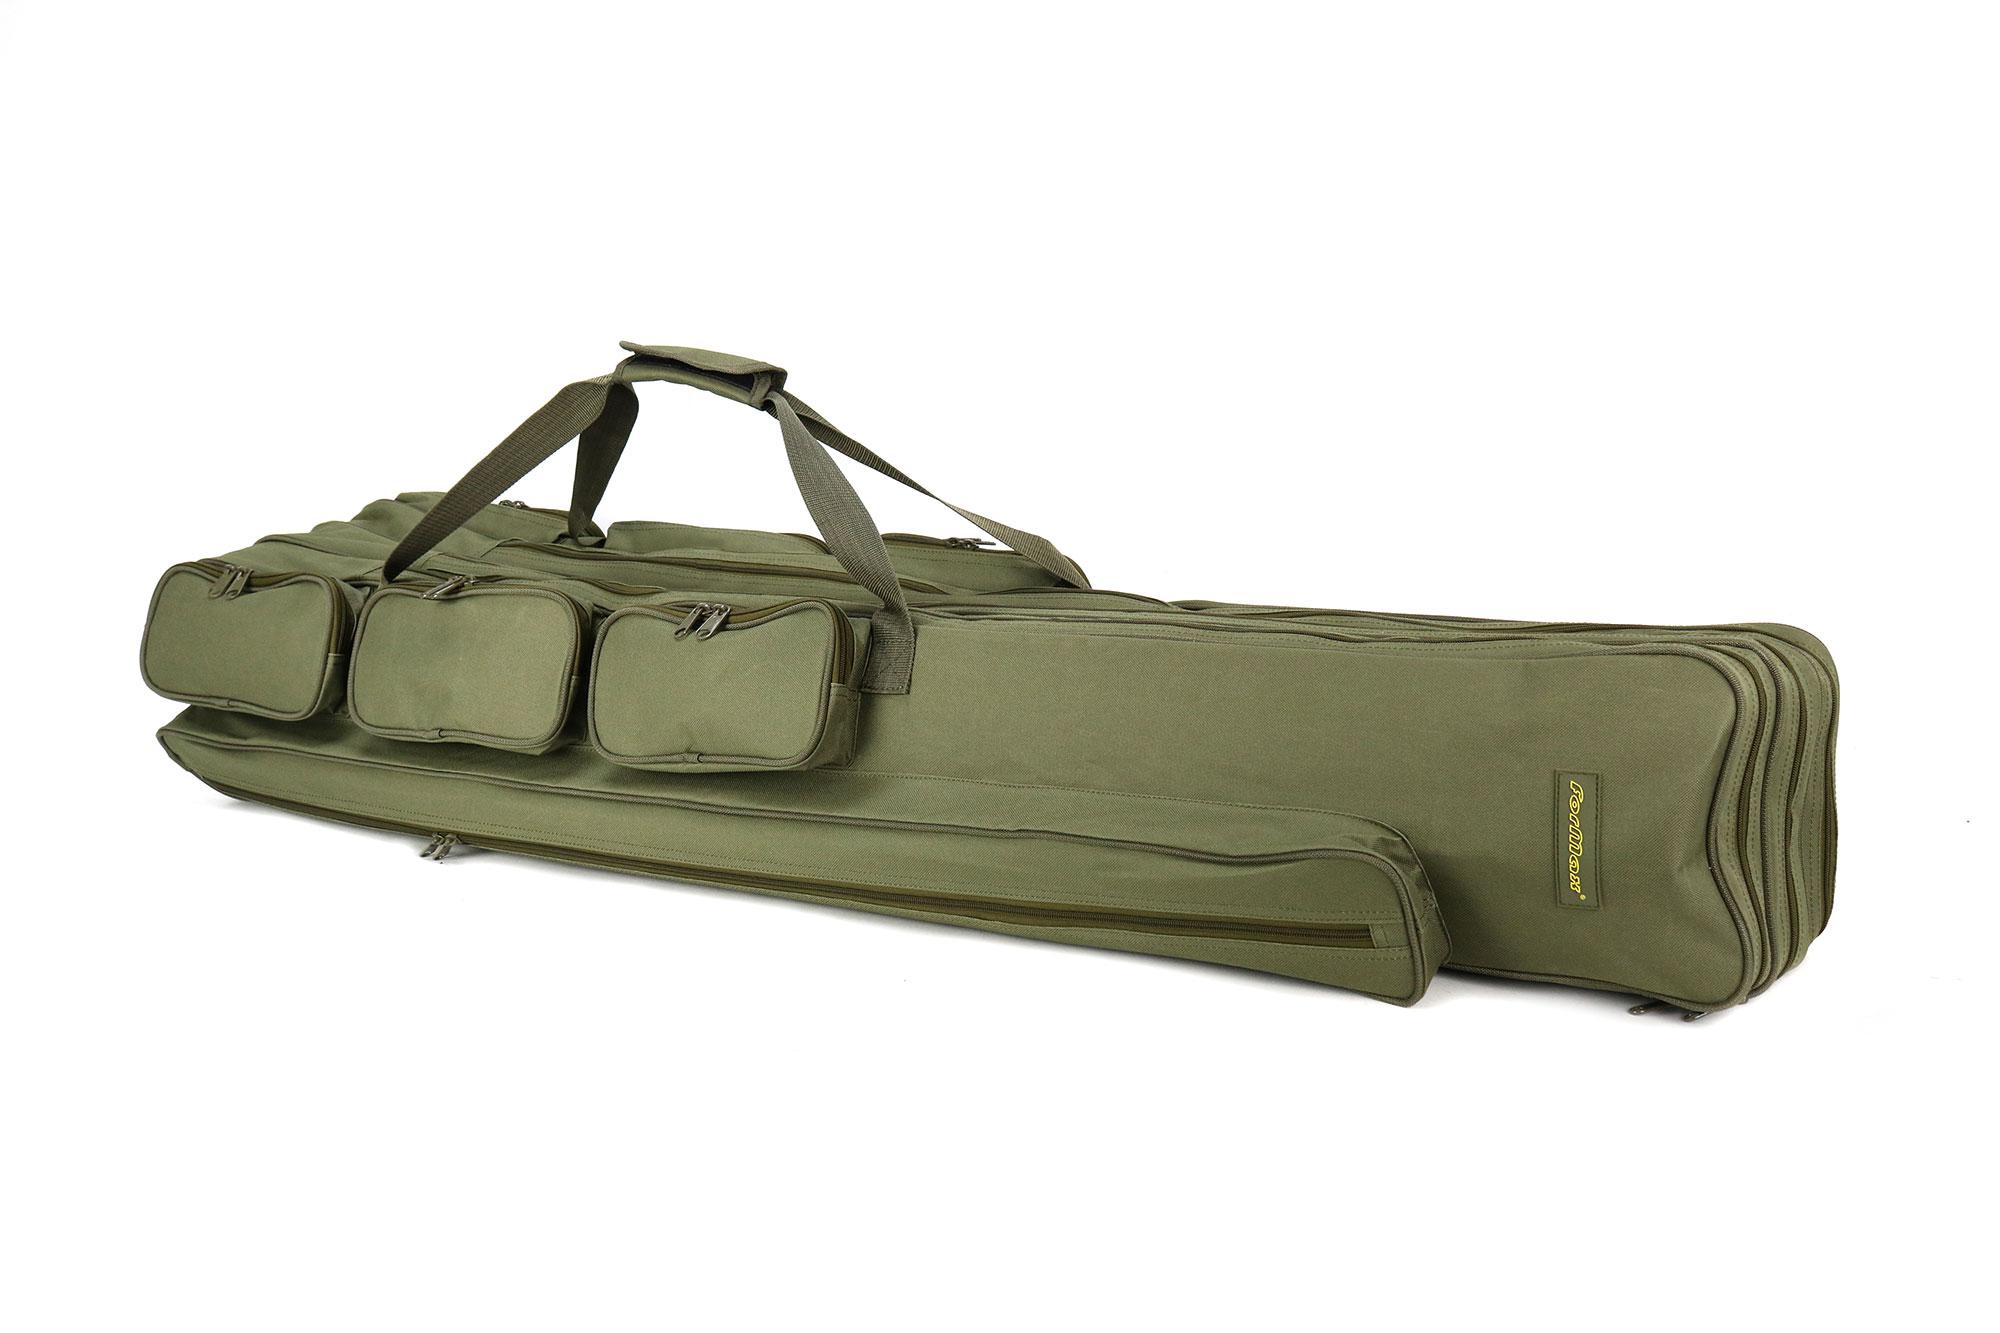 STANDARD 3 ROD BAG 100-160CM (2)